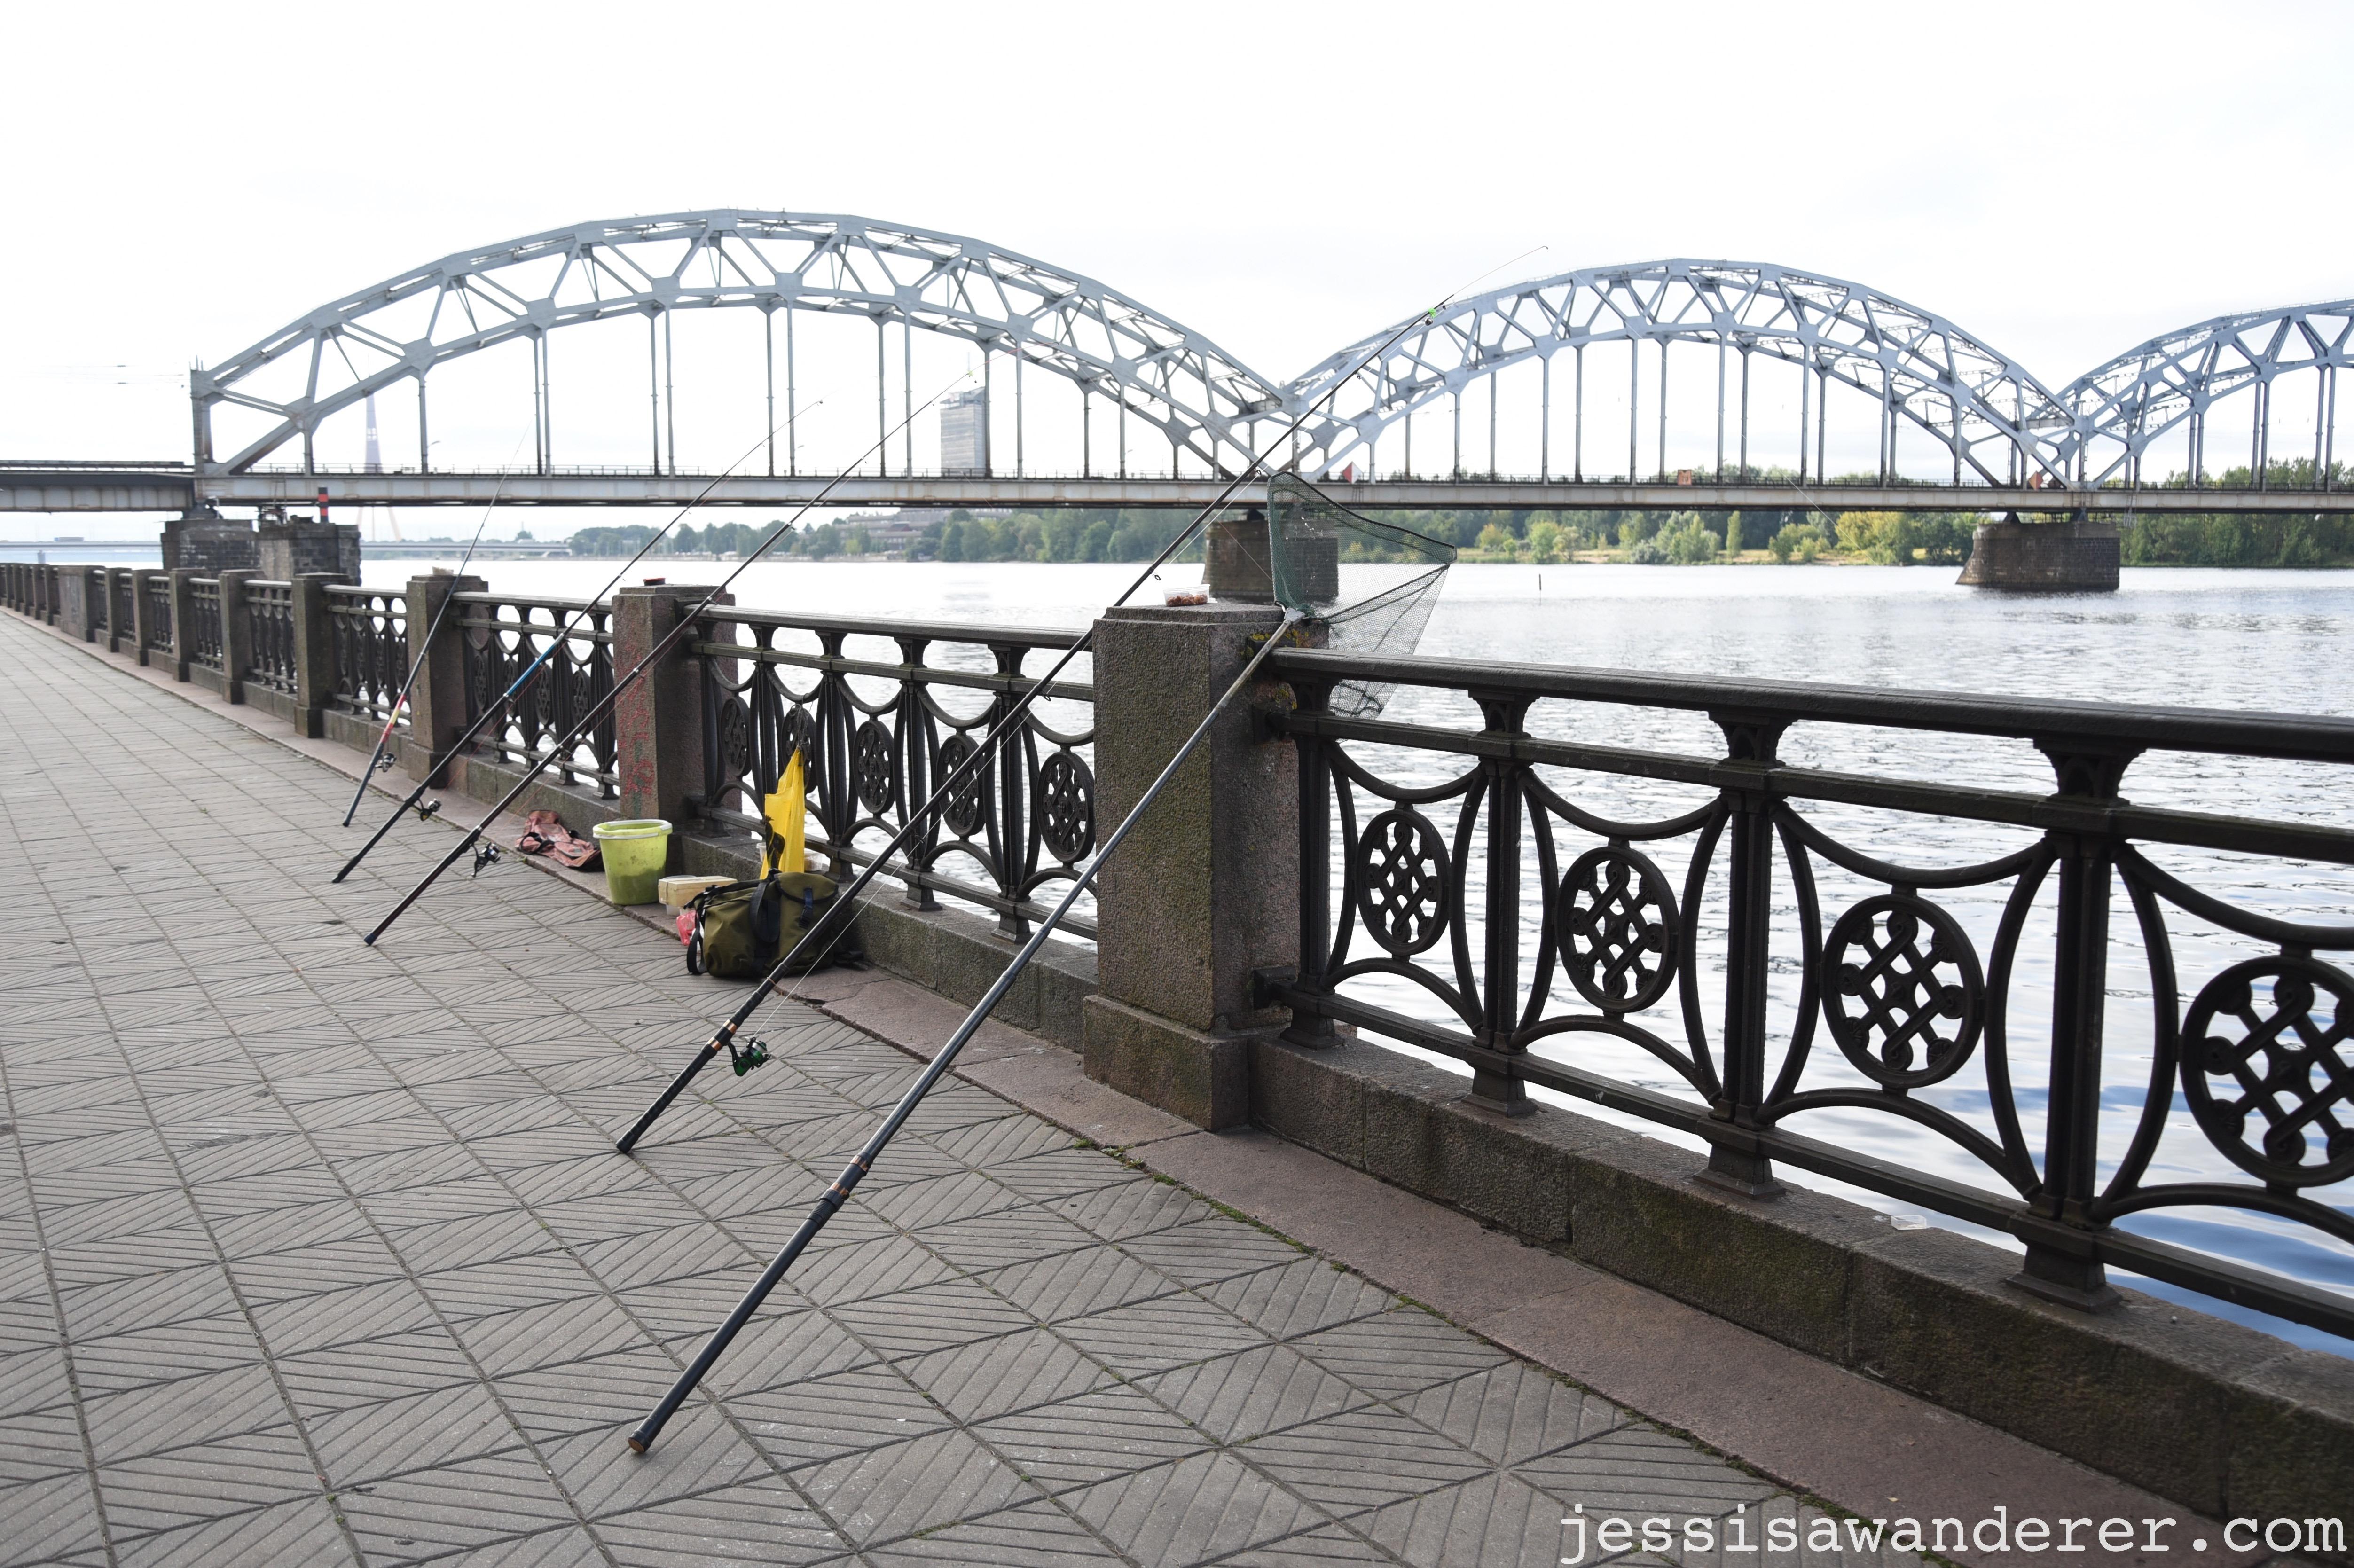 Fishing in the Daugava